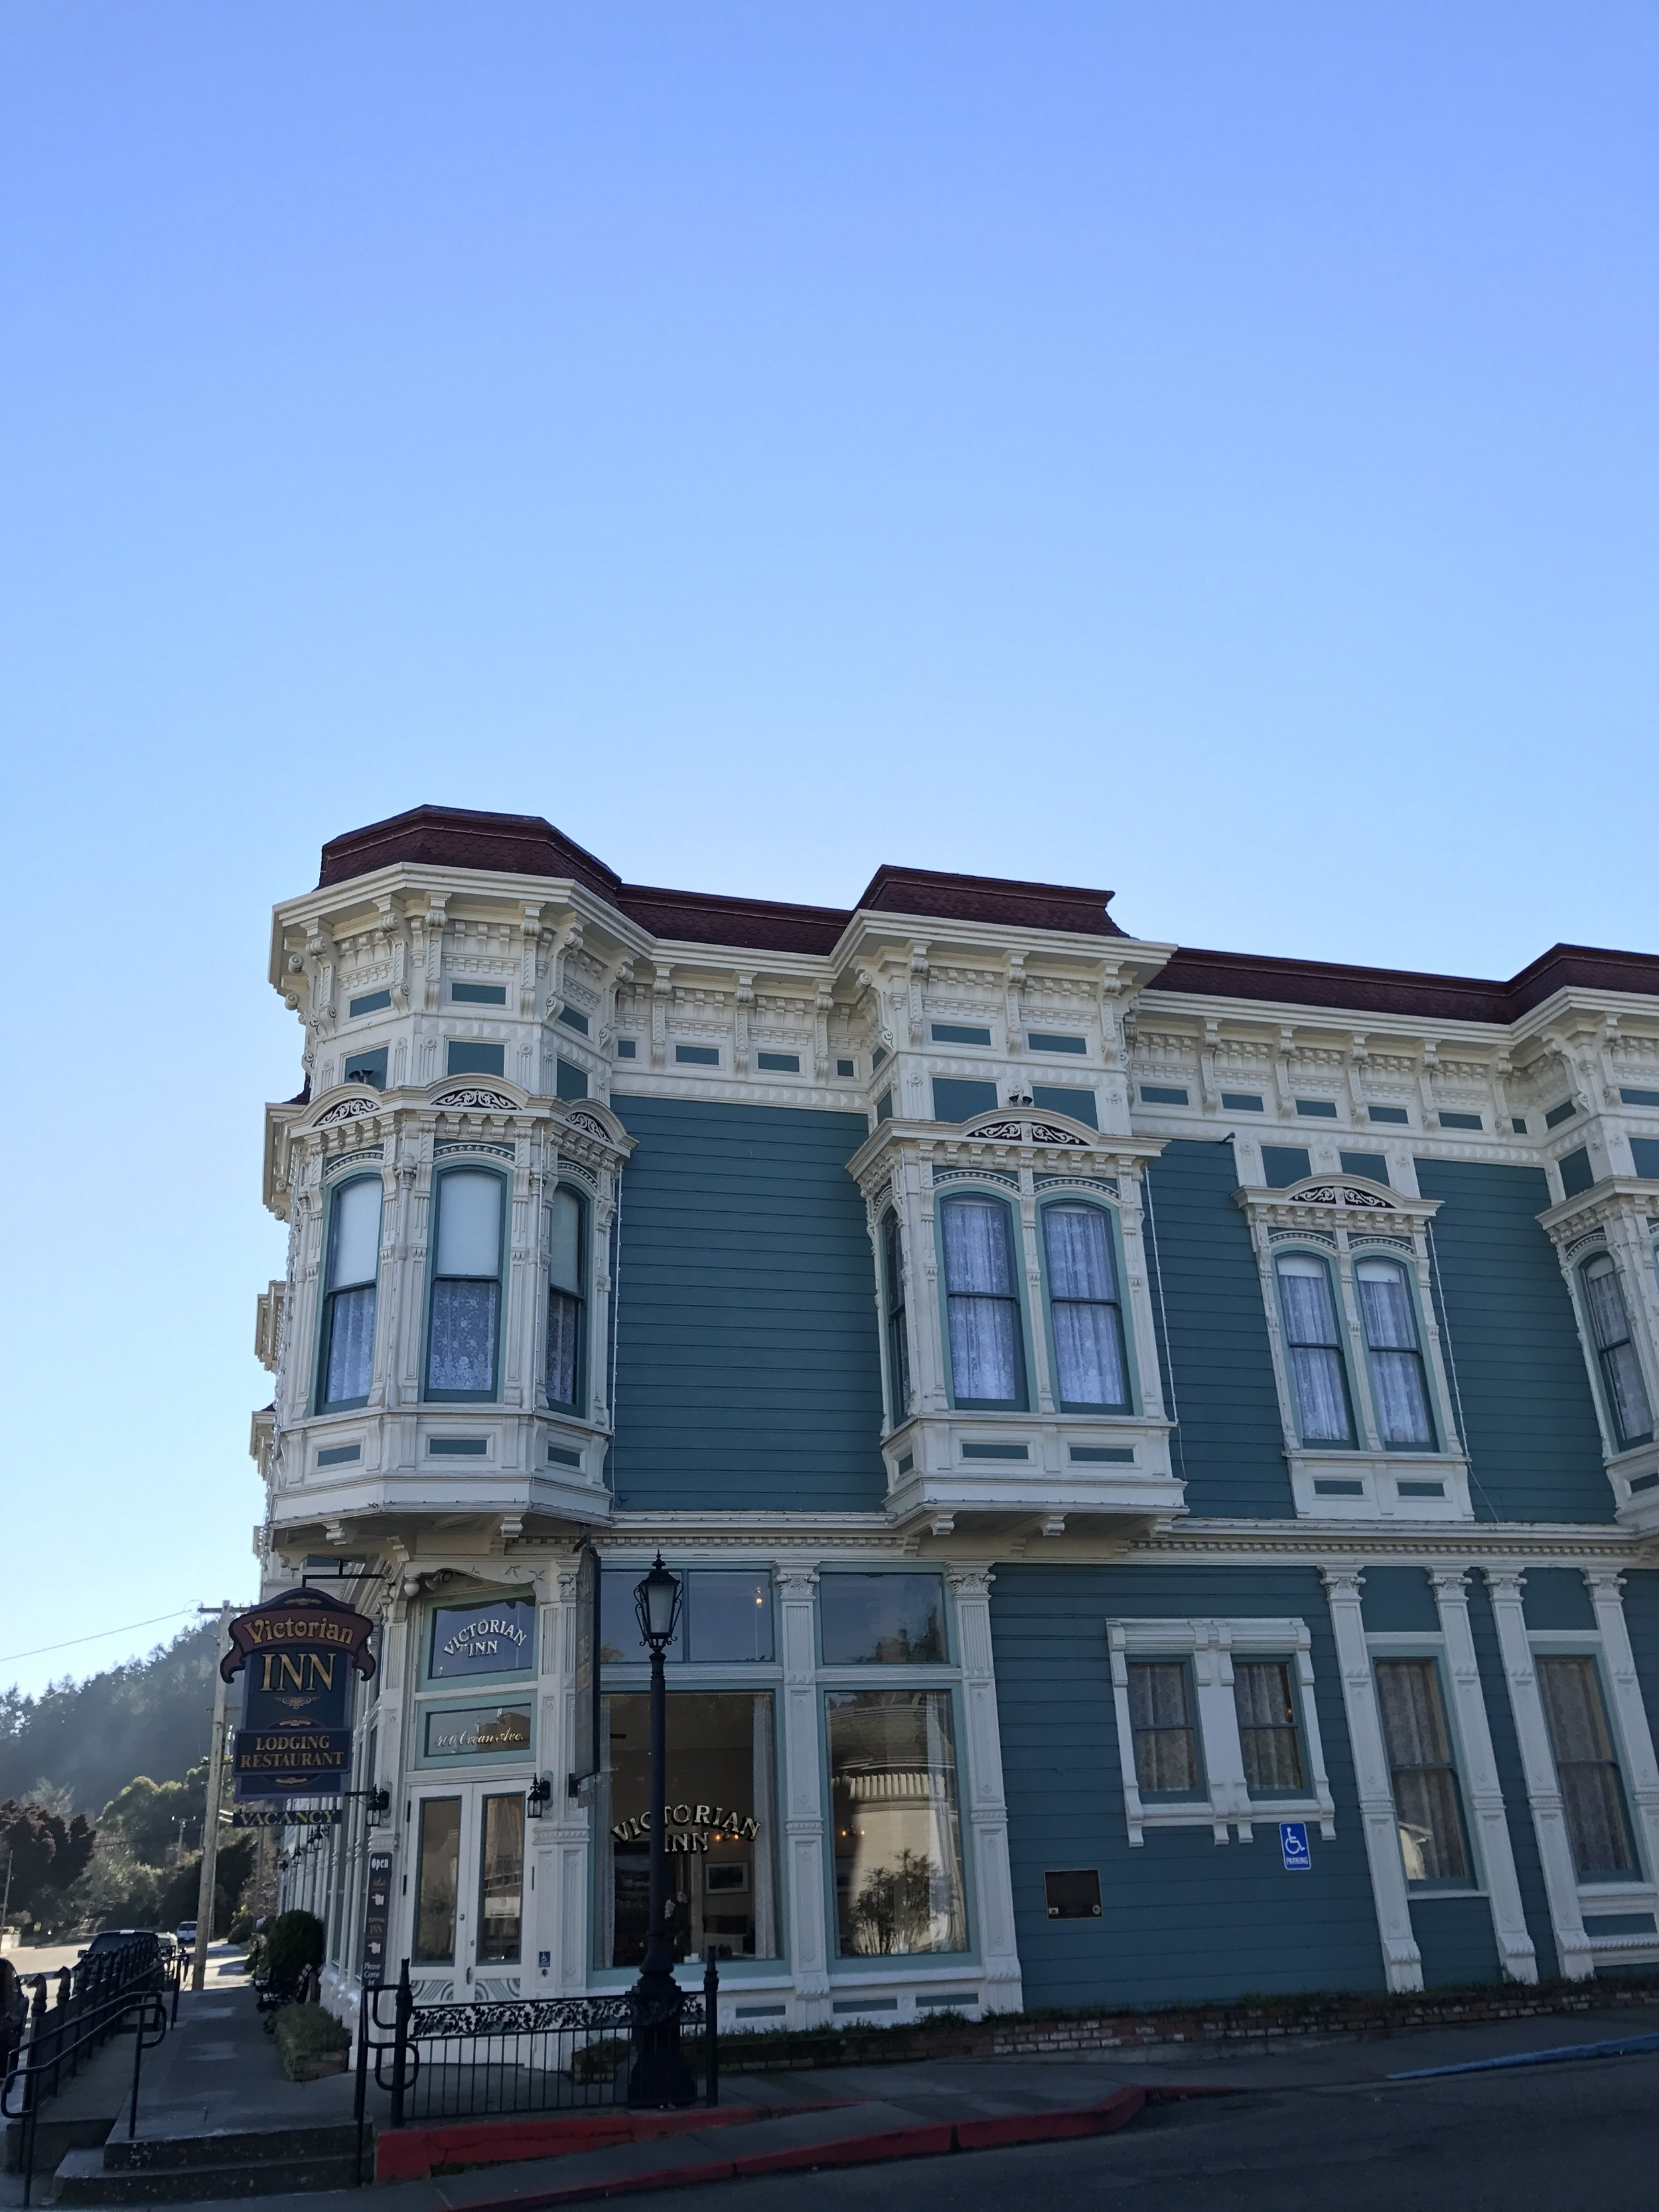 Victorian Inn in Ferndale, California